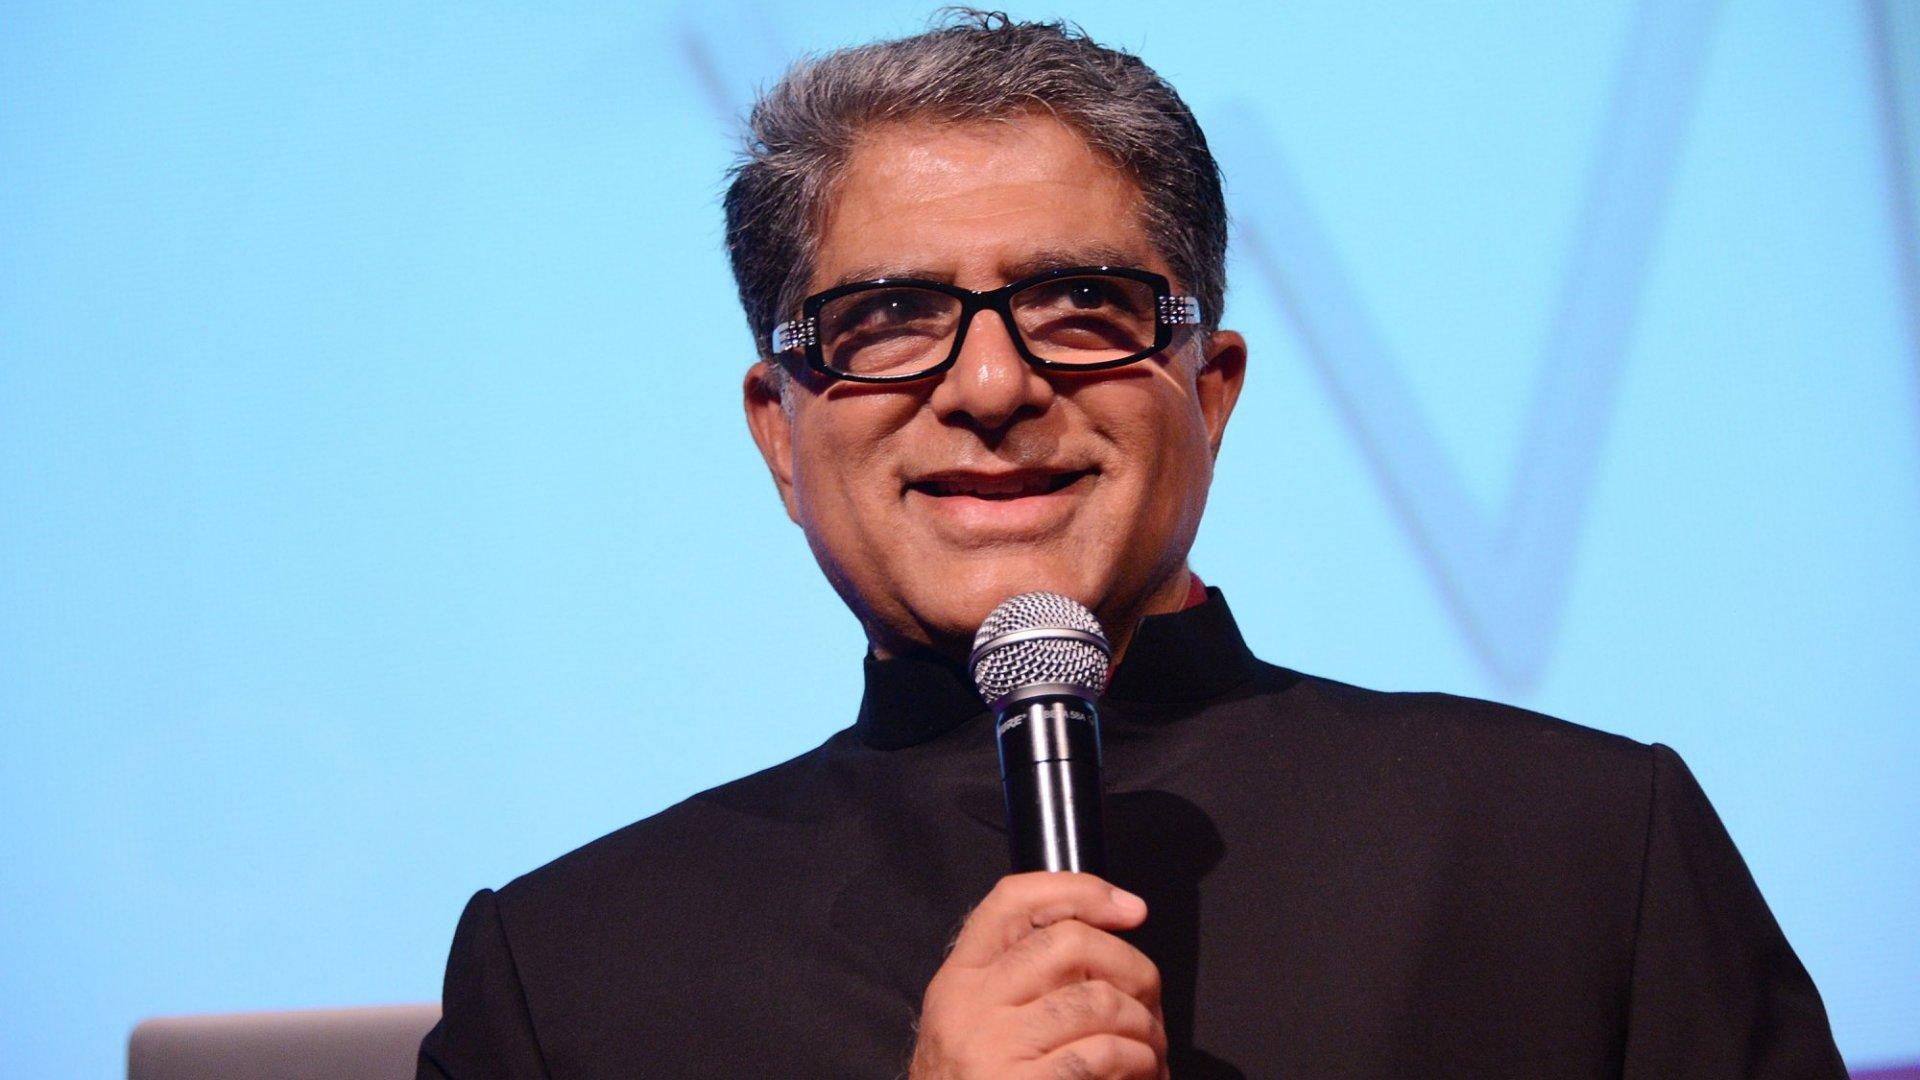 Deepak Chopra, speaking in New York in 2012.